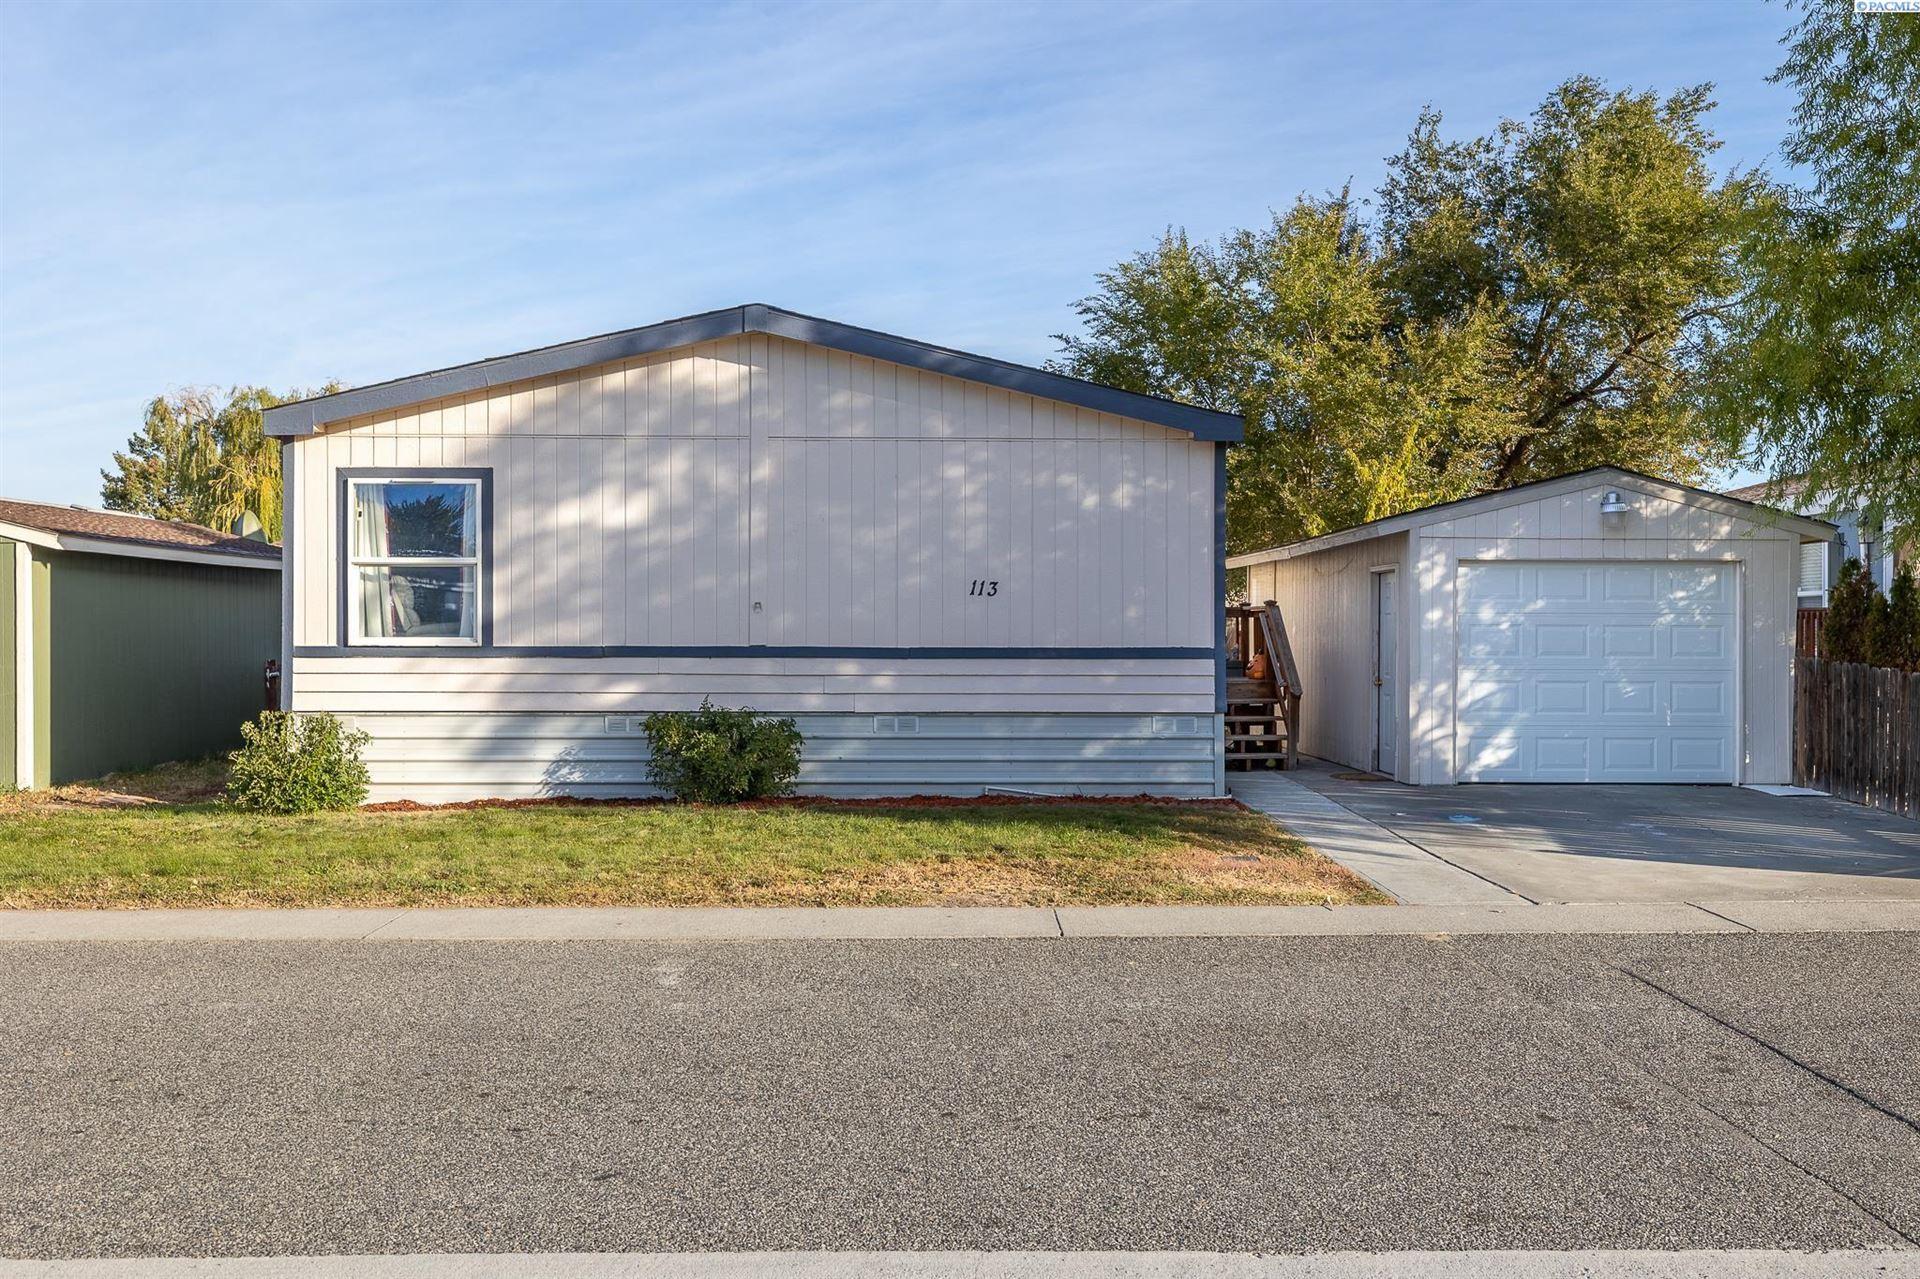 Photo of 2105 N Steptoe #113, Kennewick, WA 99336 (MLS # 257184)